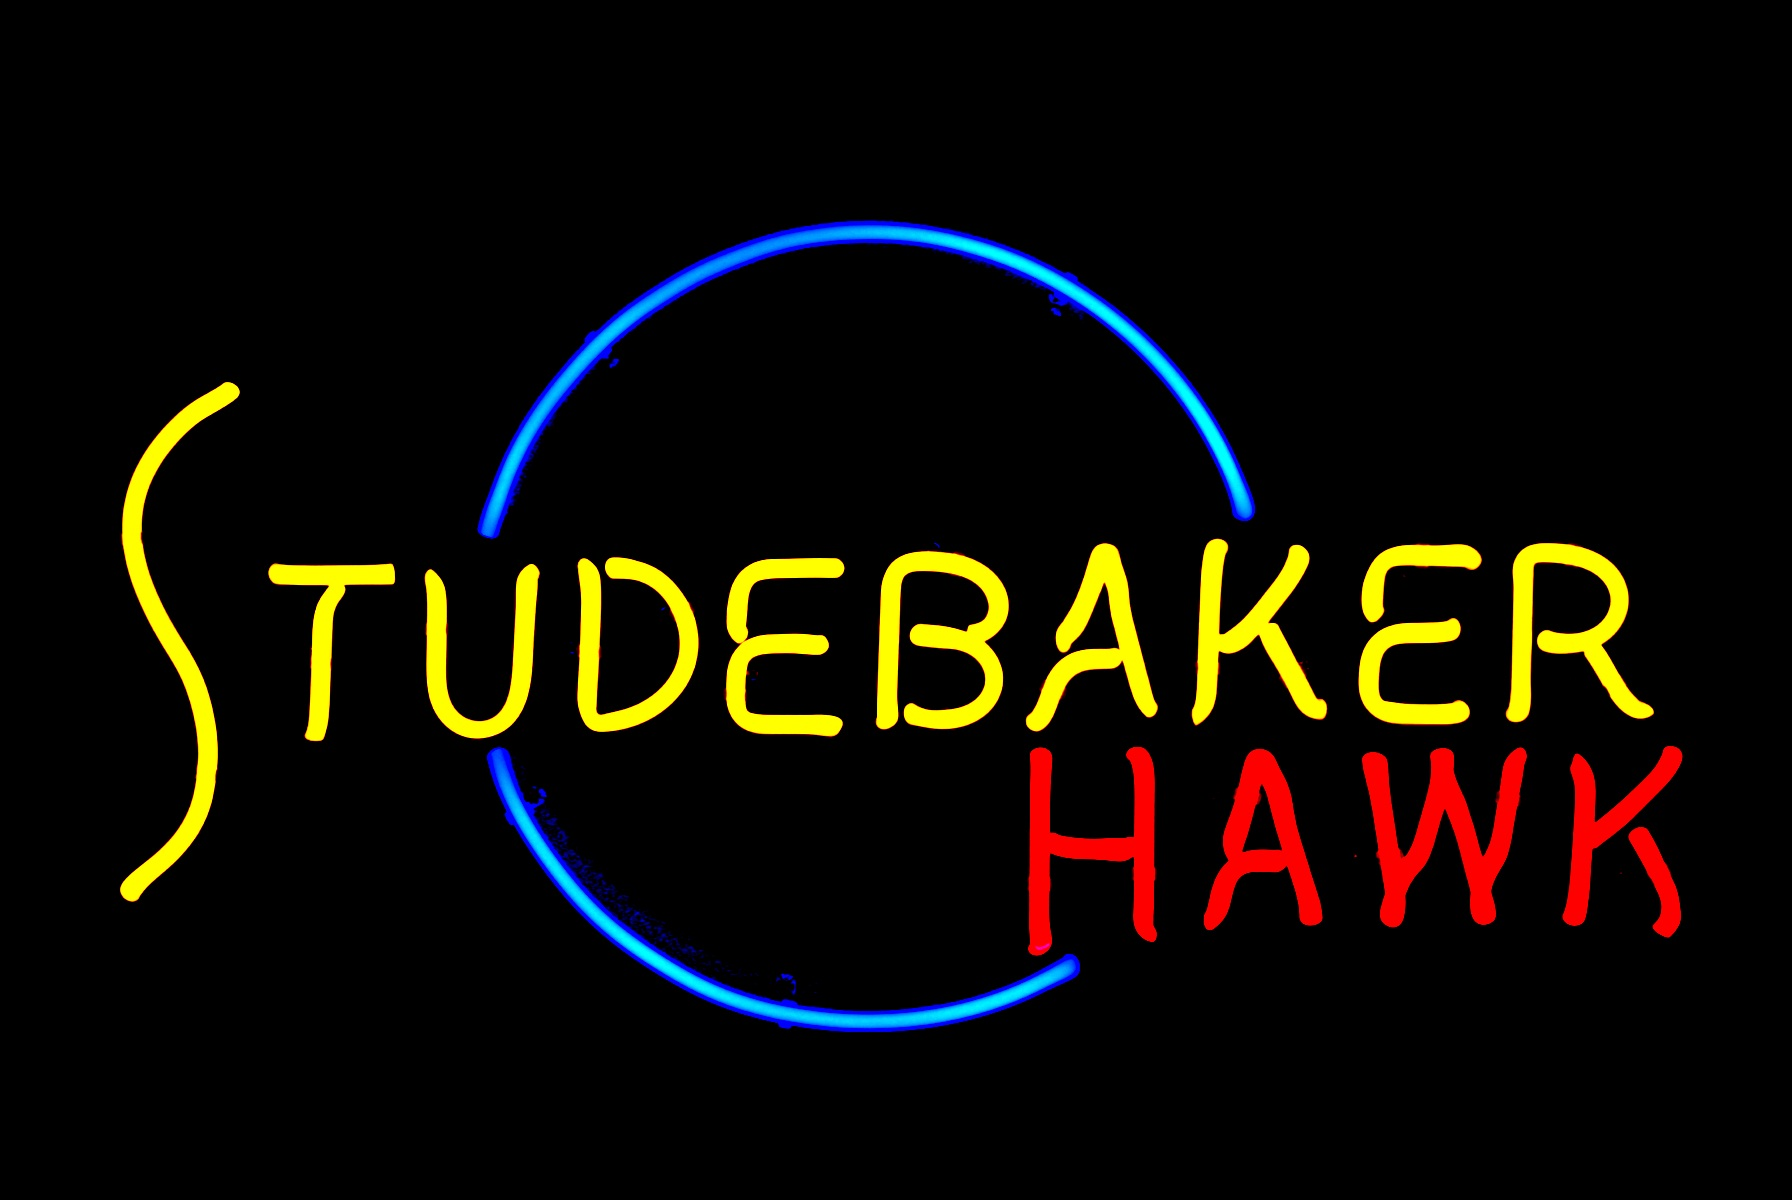 Studebaker Hawk Dealership Showroom Neon Sign by John Barton - former Studebaker Packard New Car Dealer